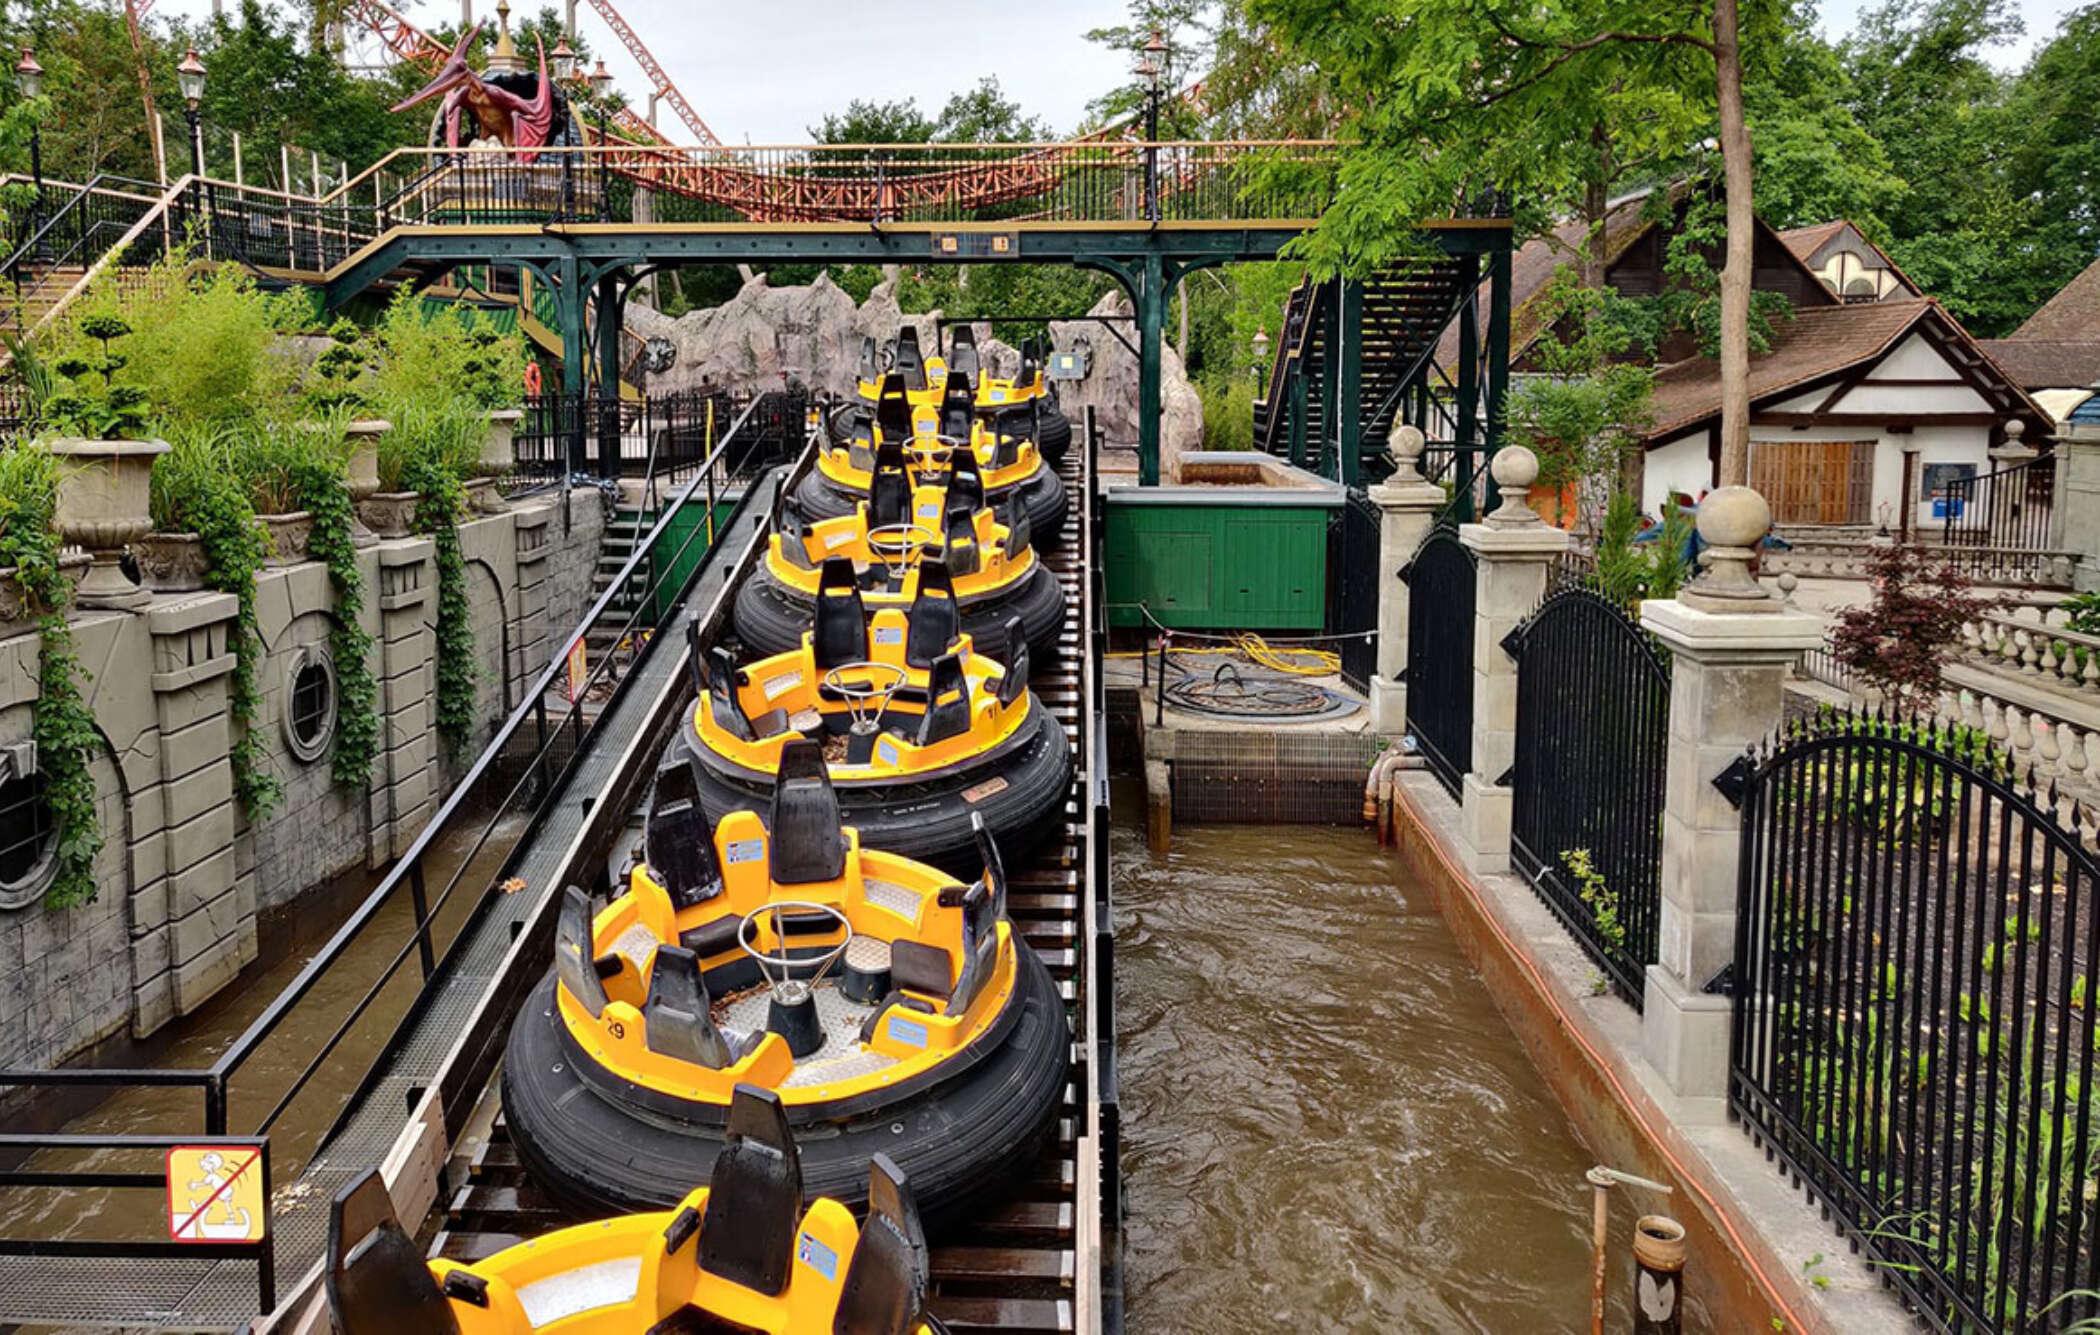 Dino splash 7